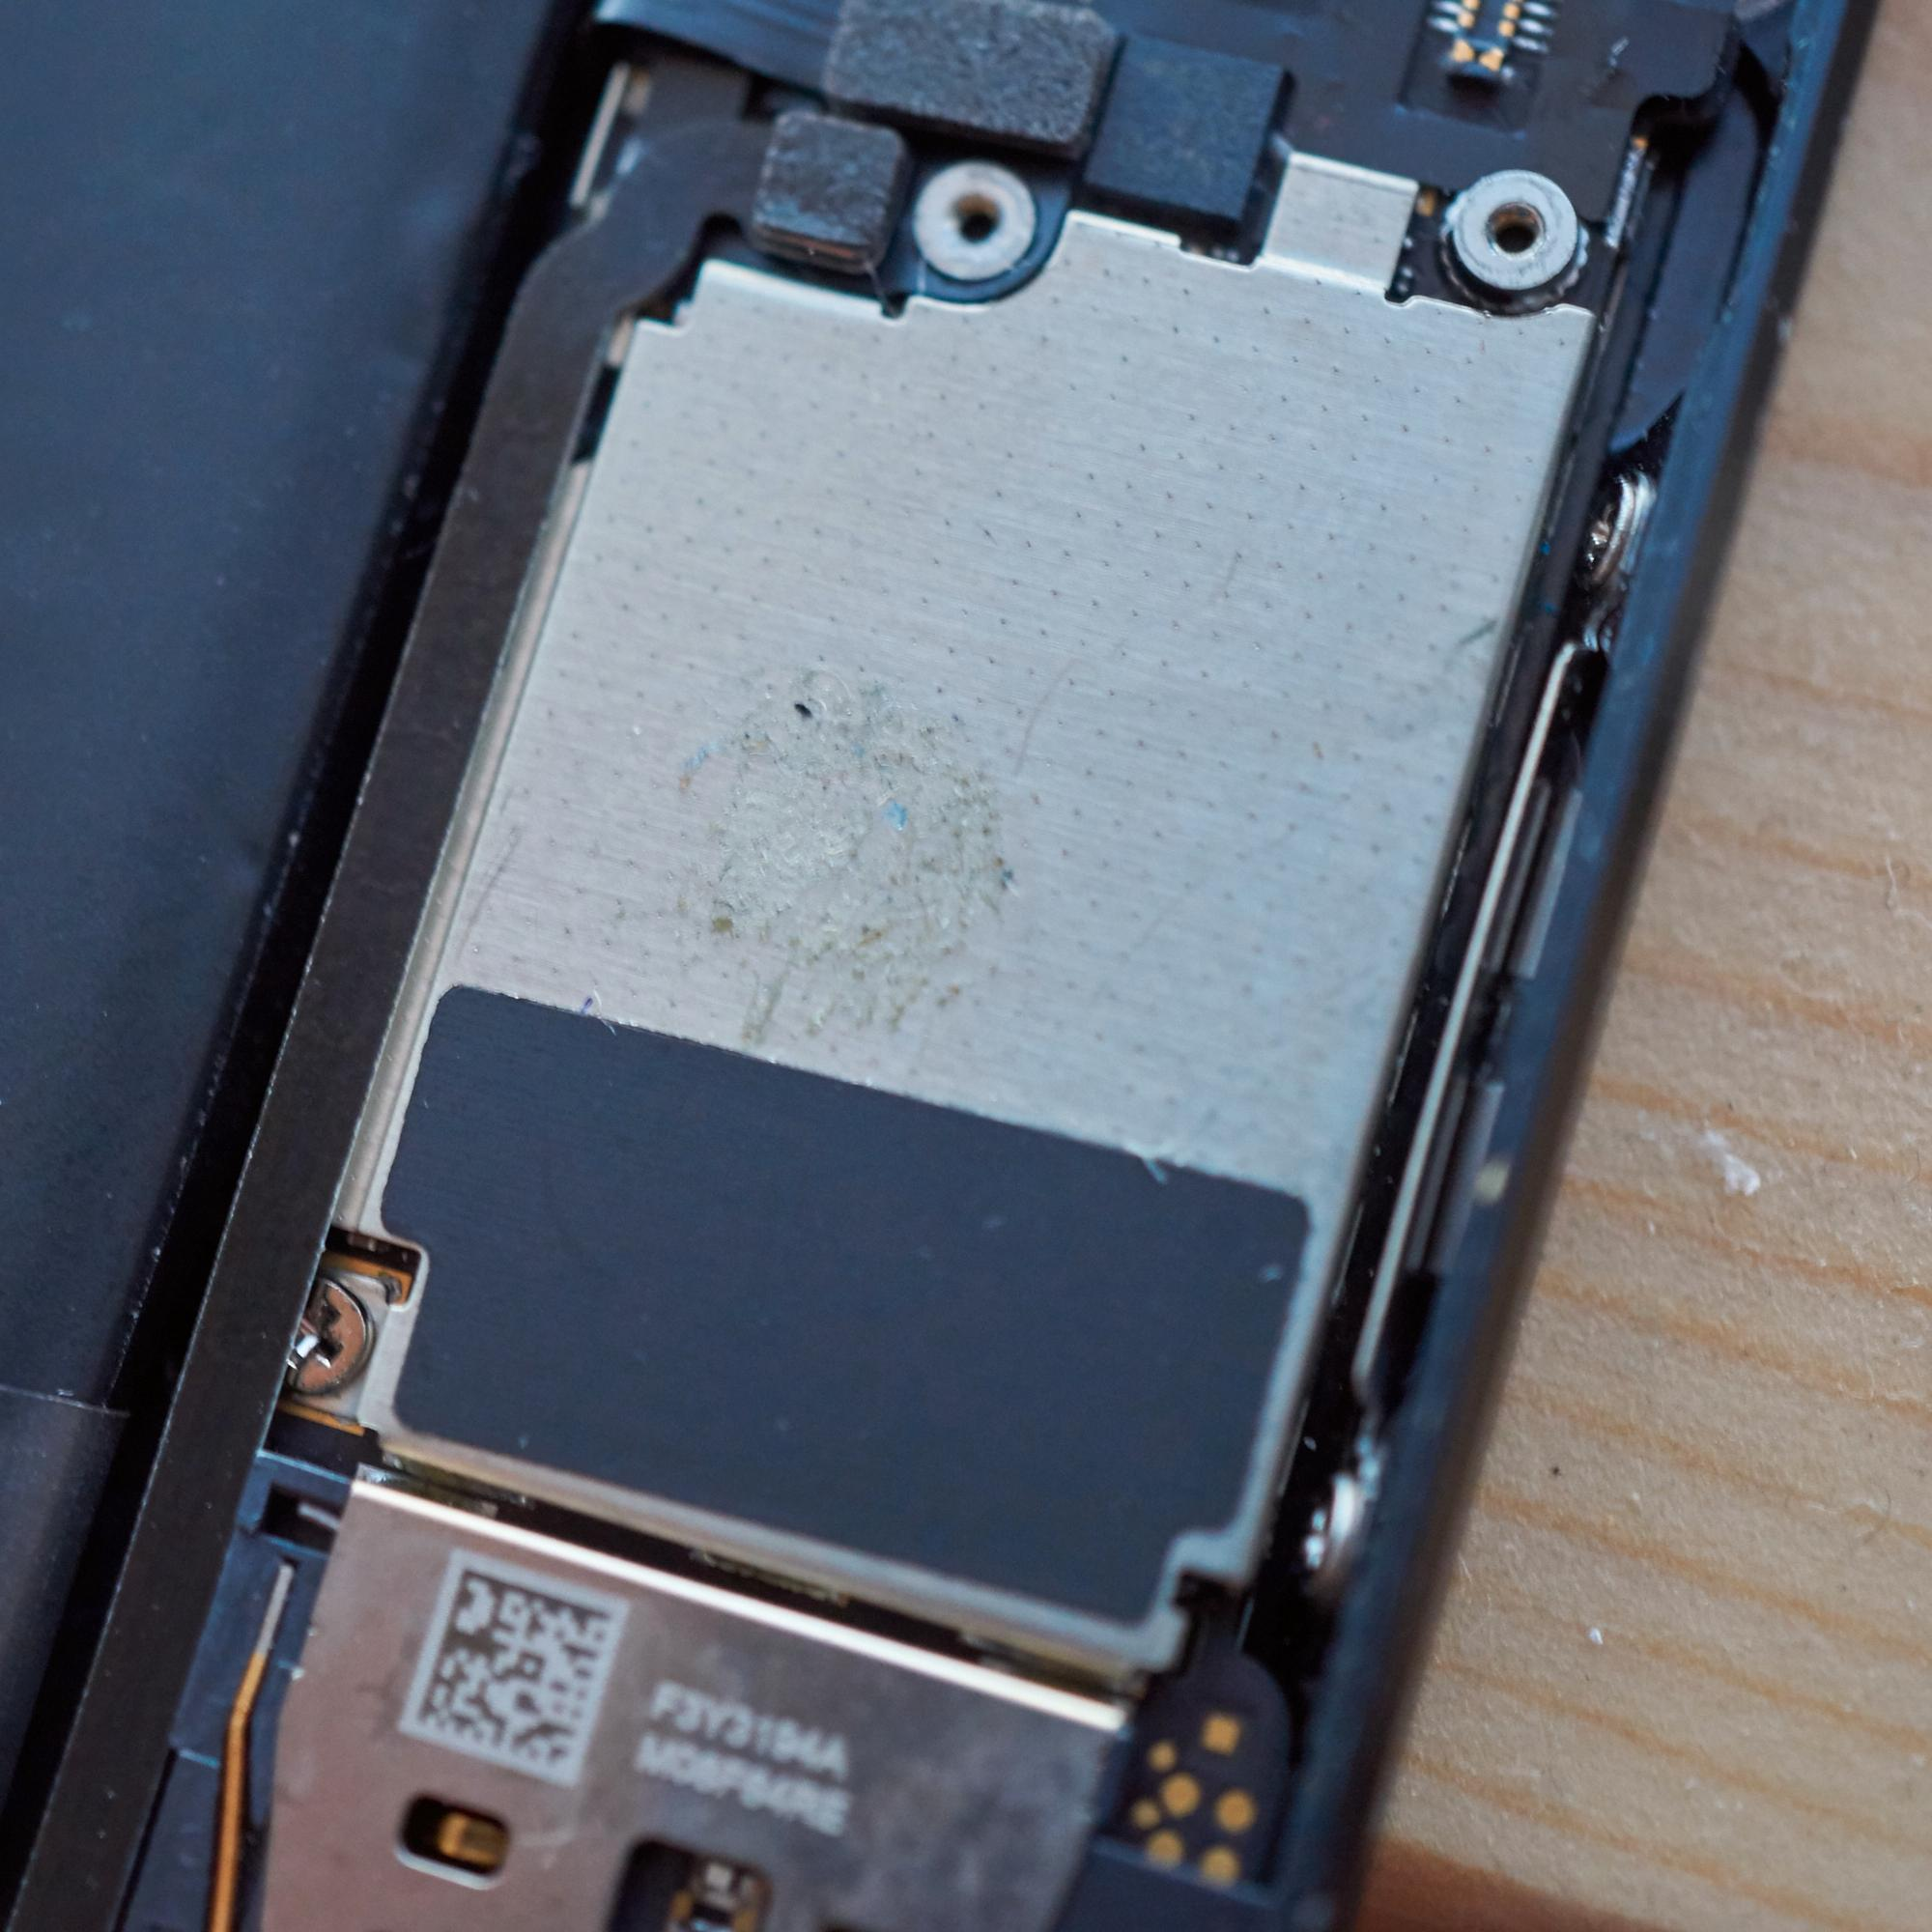 Prosessor og hovedkort, iPhone 5.